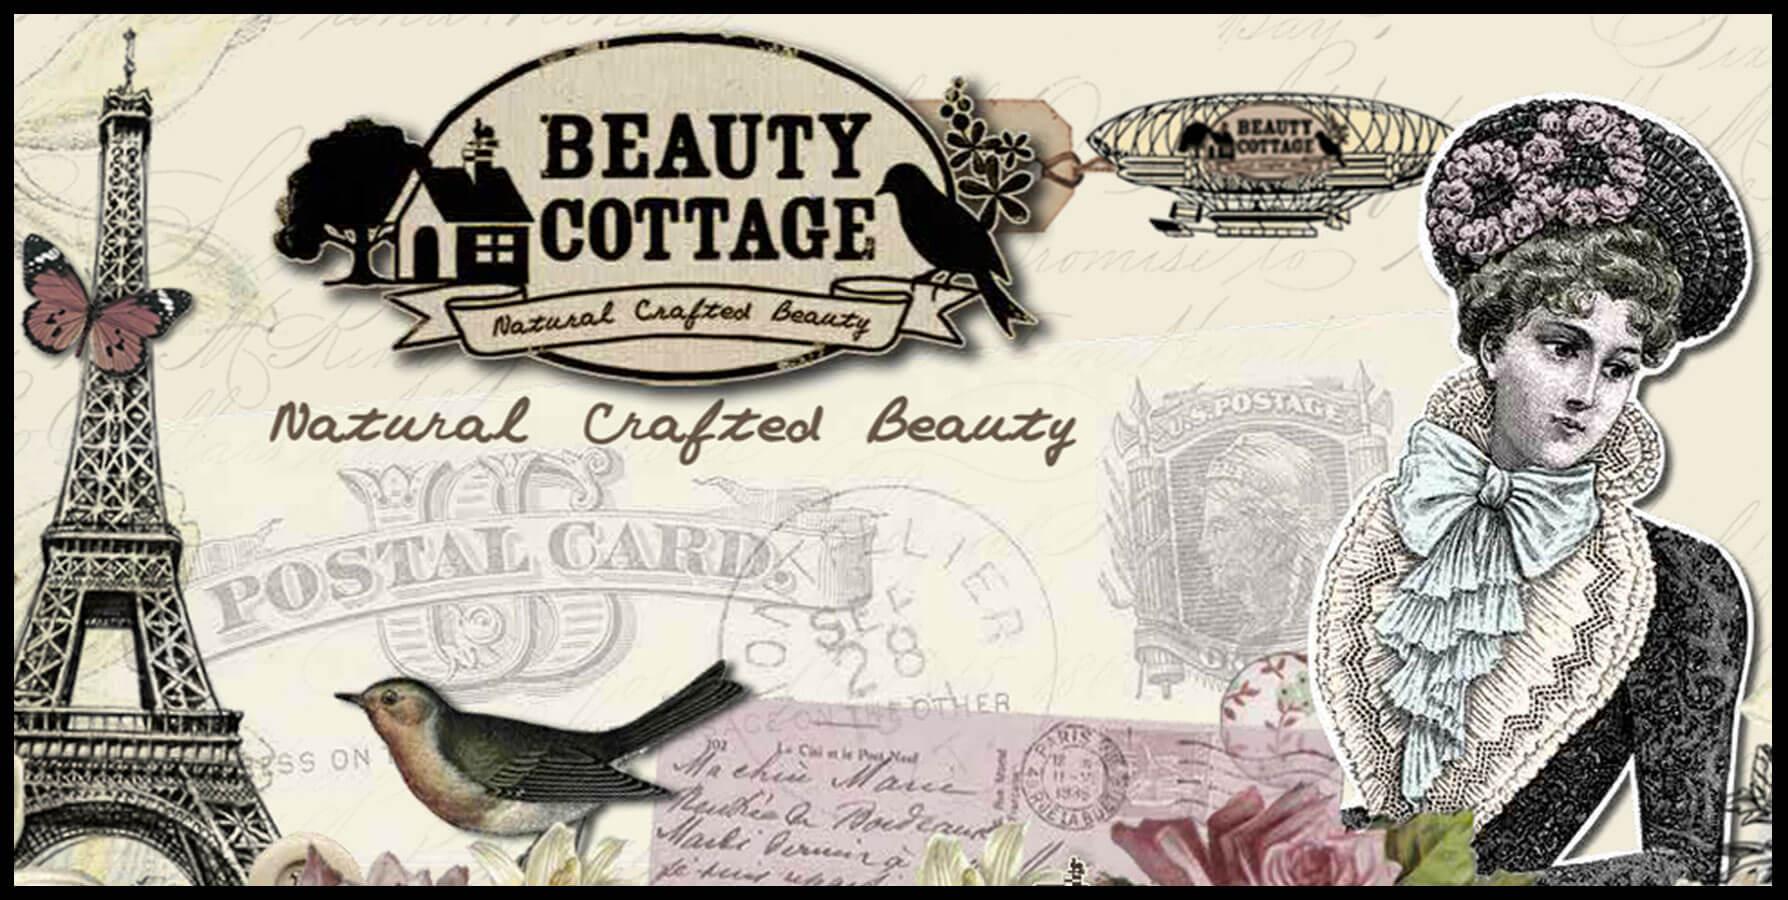 Beauty Cottage,Luxury Eyeshadow Palette,อายแชโดว์Beauty Cottage ,ลักชัวรี่ อายแชโดว์ พาเลท ,บิวตี้ คอจเทจ,Beauty Cottage Luxury Eyeshadow Paletteรีวิว,Beauty Cottage Luxury Eyeshadow Paletteราคา